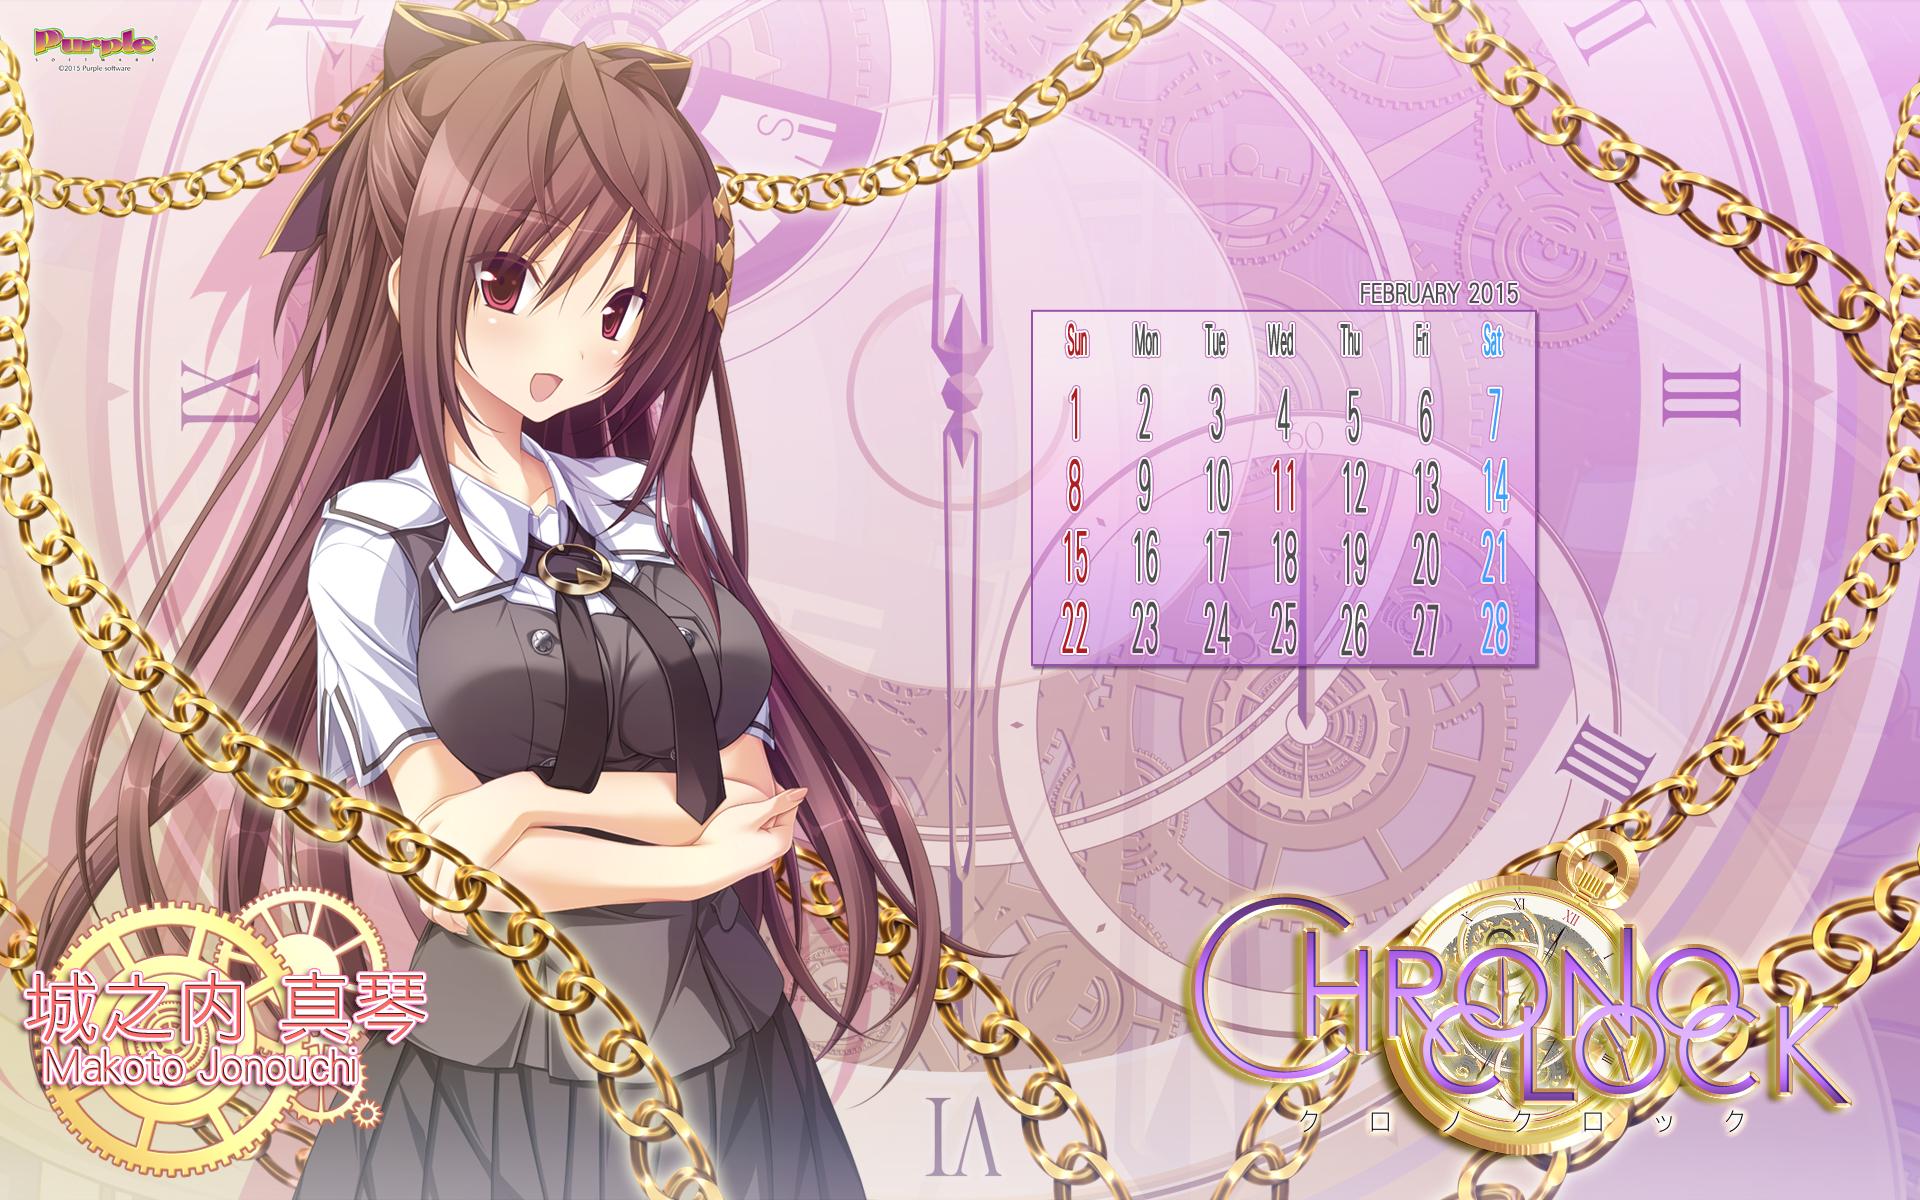 Calendar Clock Wallpaper : Jonouchi makoto chrono clock wallpaper #1833266 zerochan anime